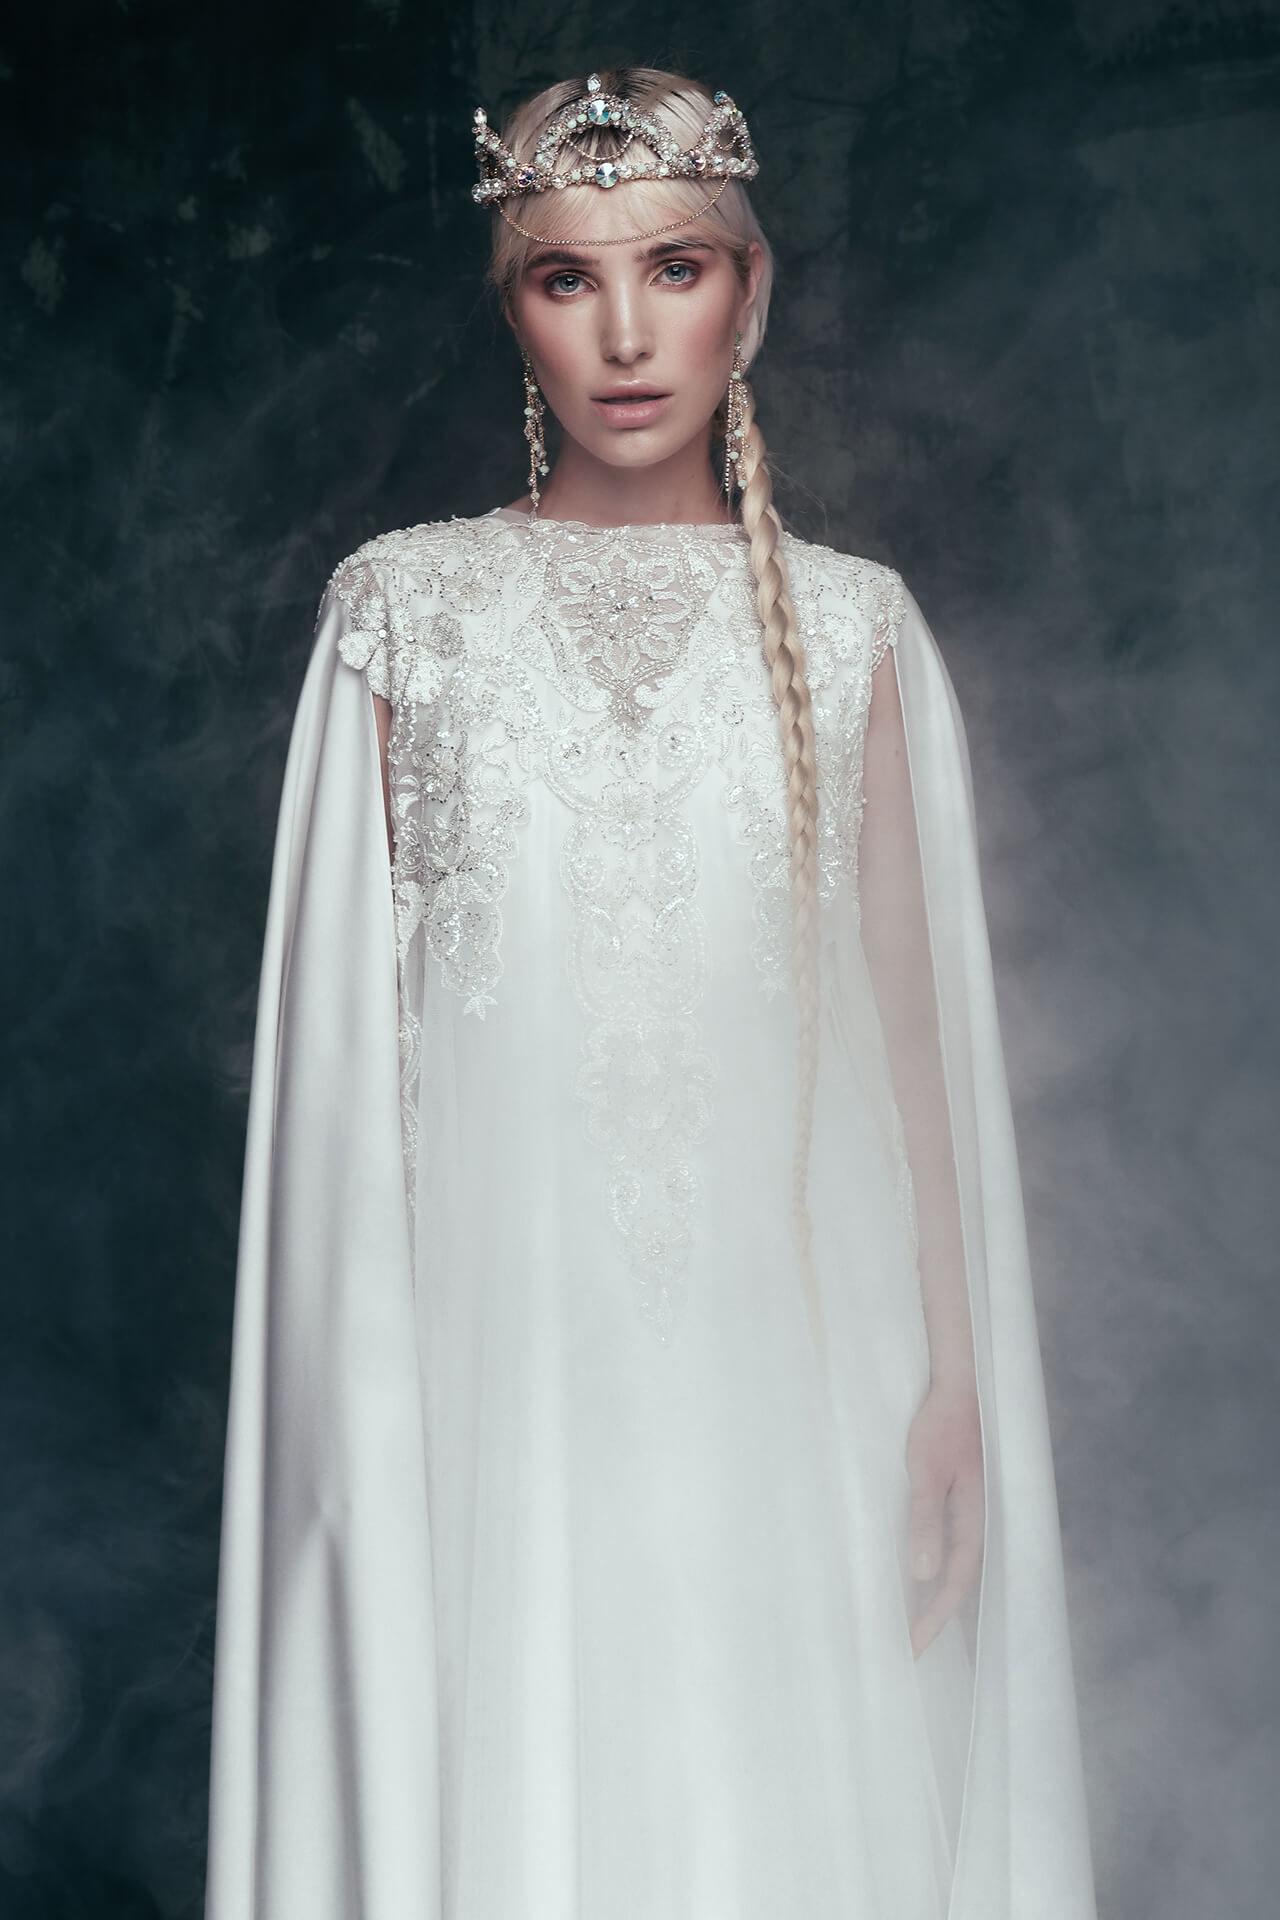 Velina, Anna reine de France